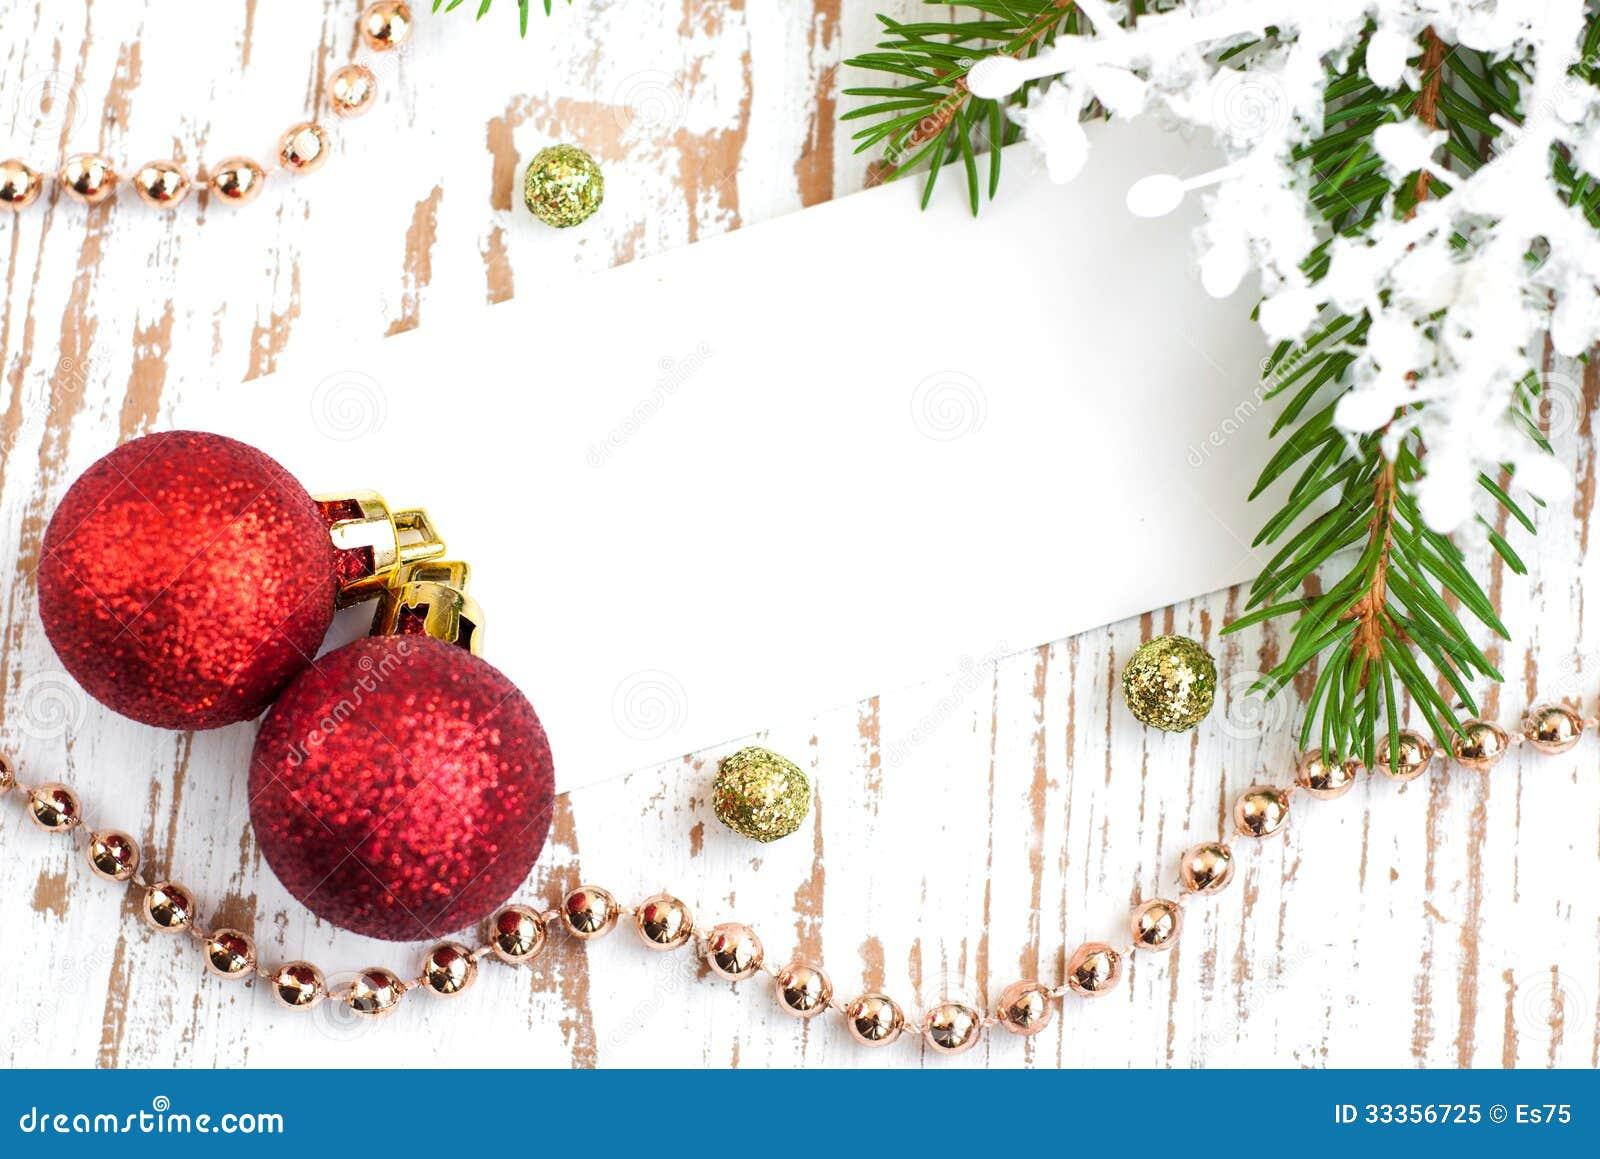 Christmas Card Decoration | Holliday Decorations